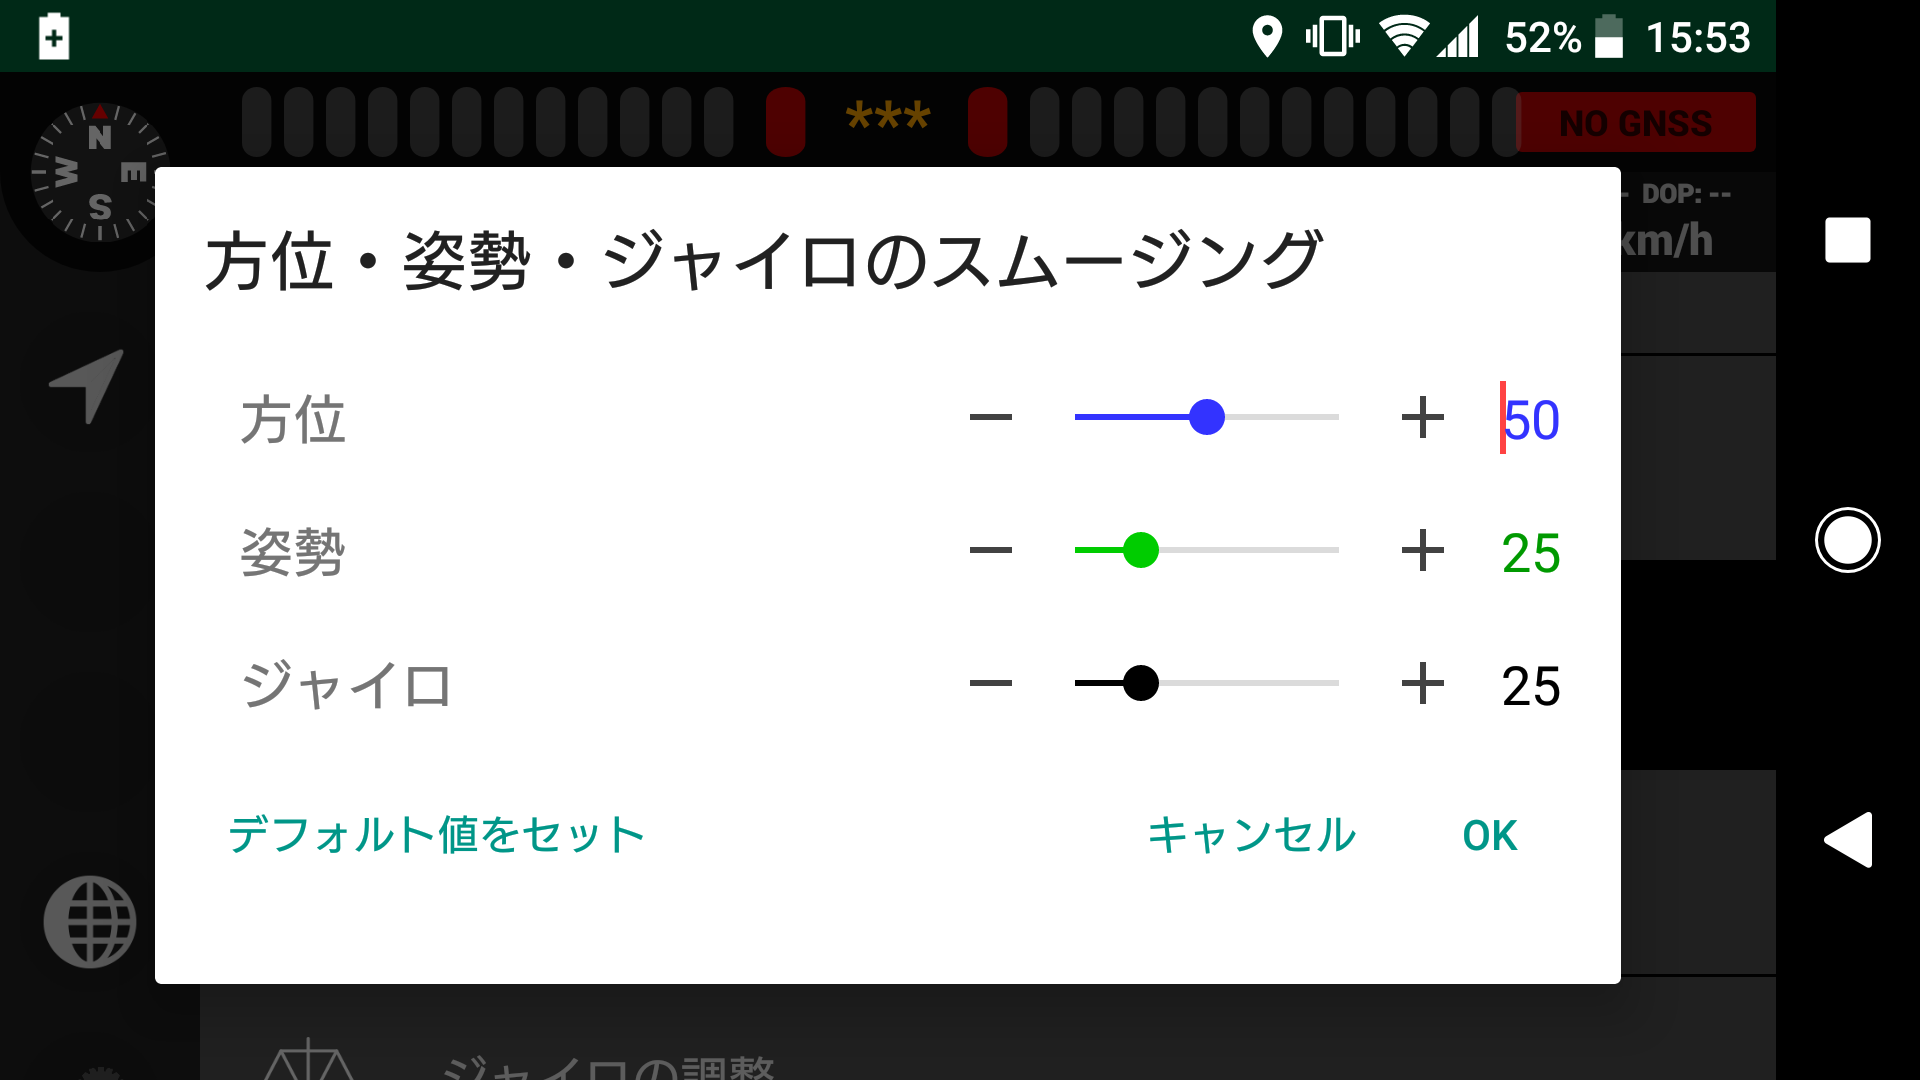 AgriBus-NAVIアプリ バージョンアップのお知らせ(v3.8.7)